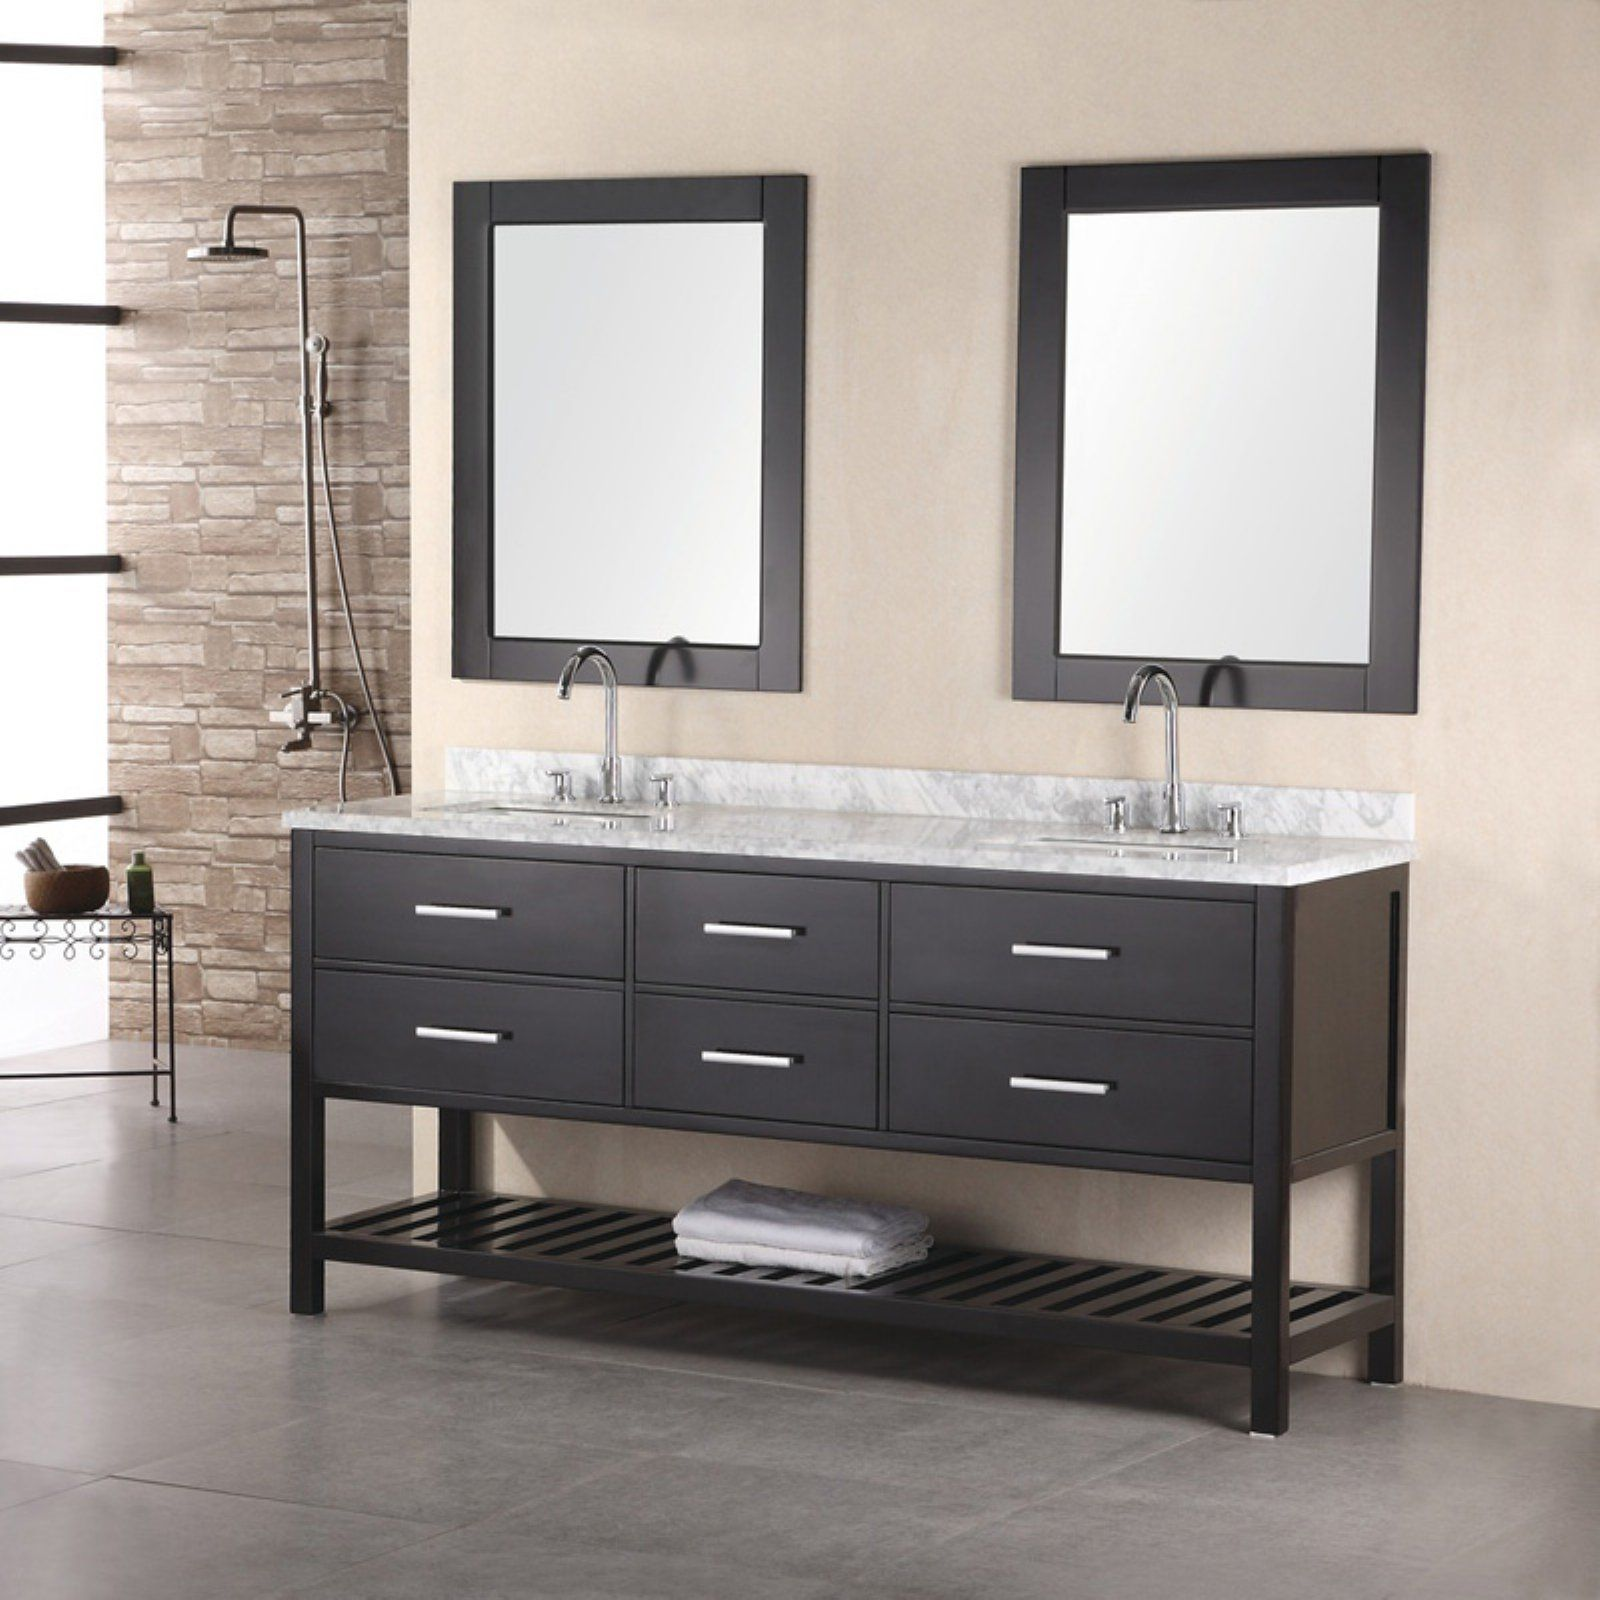 43++ Espresso free standing bathroom cabinets type